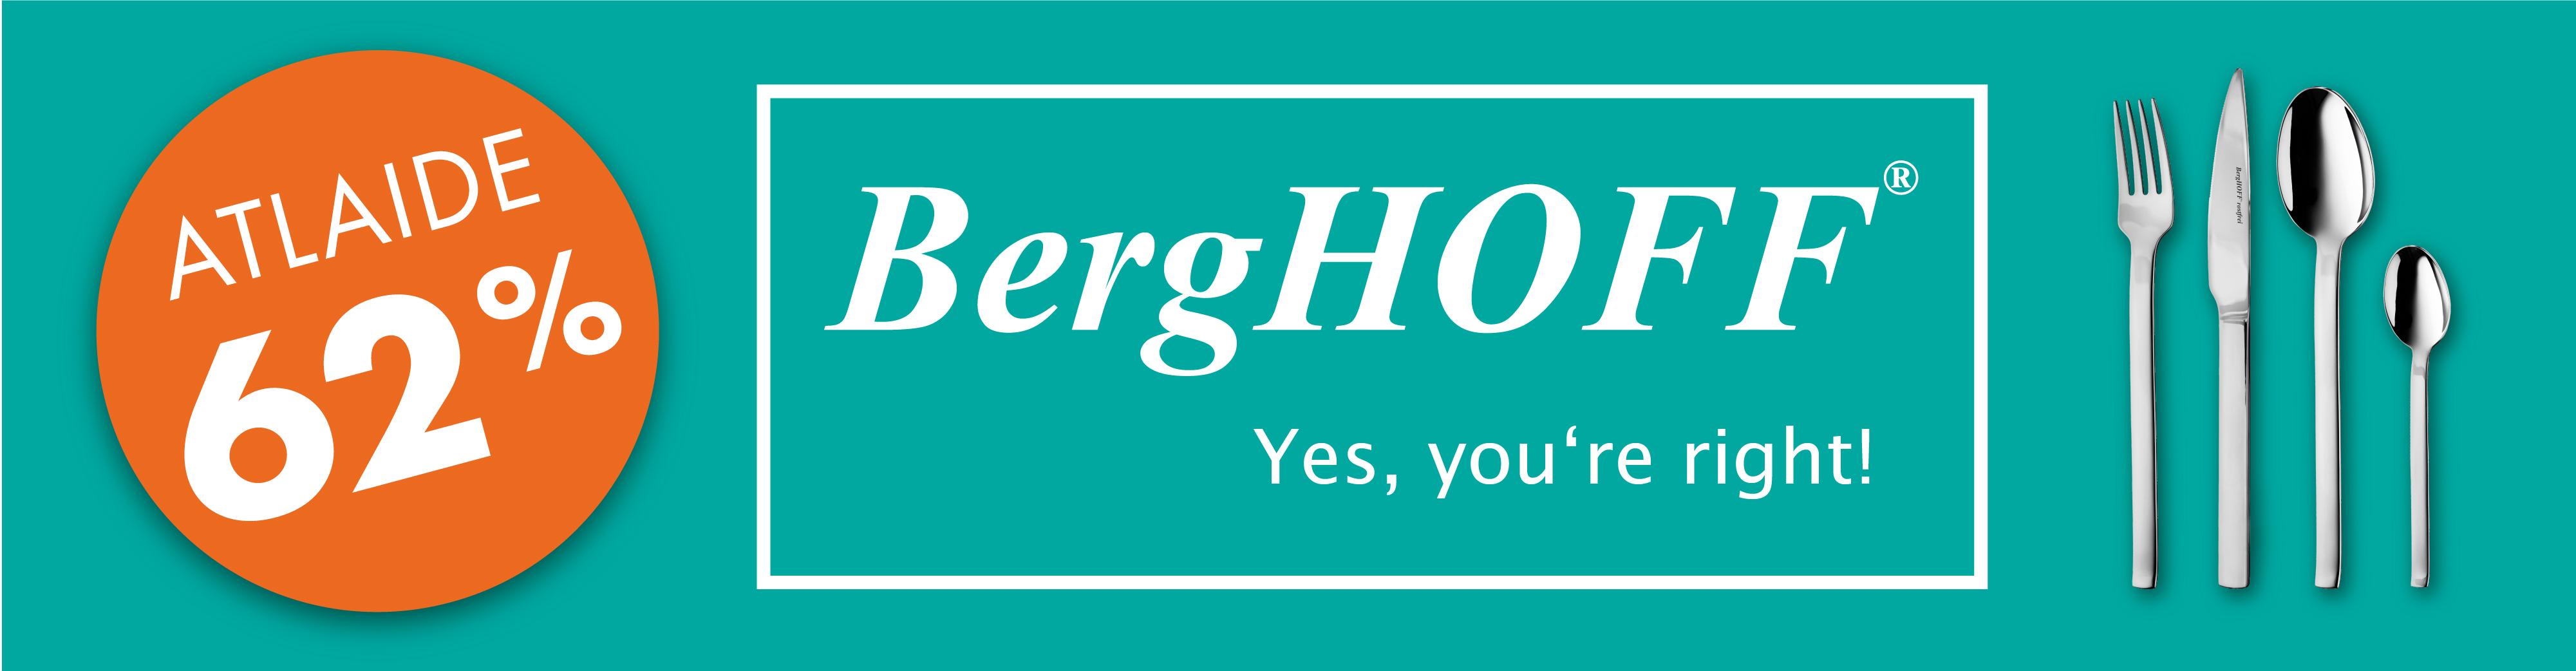 berghoff_web_lv-01-002